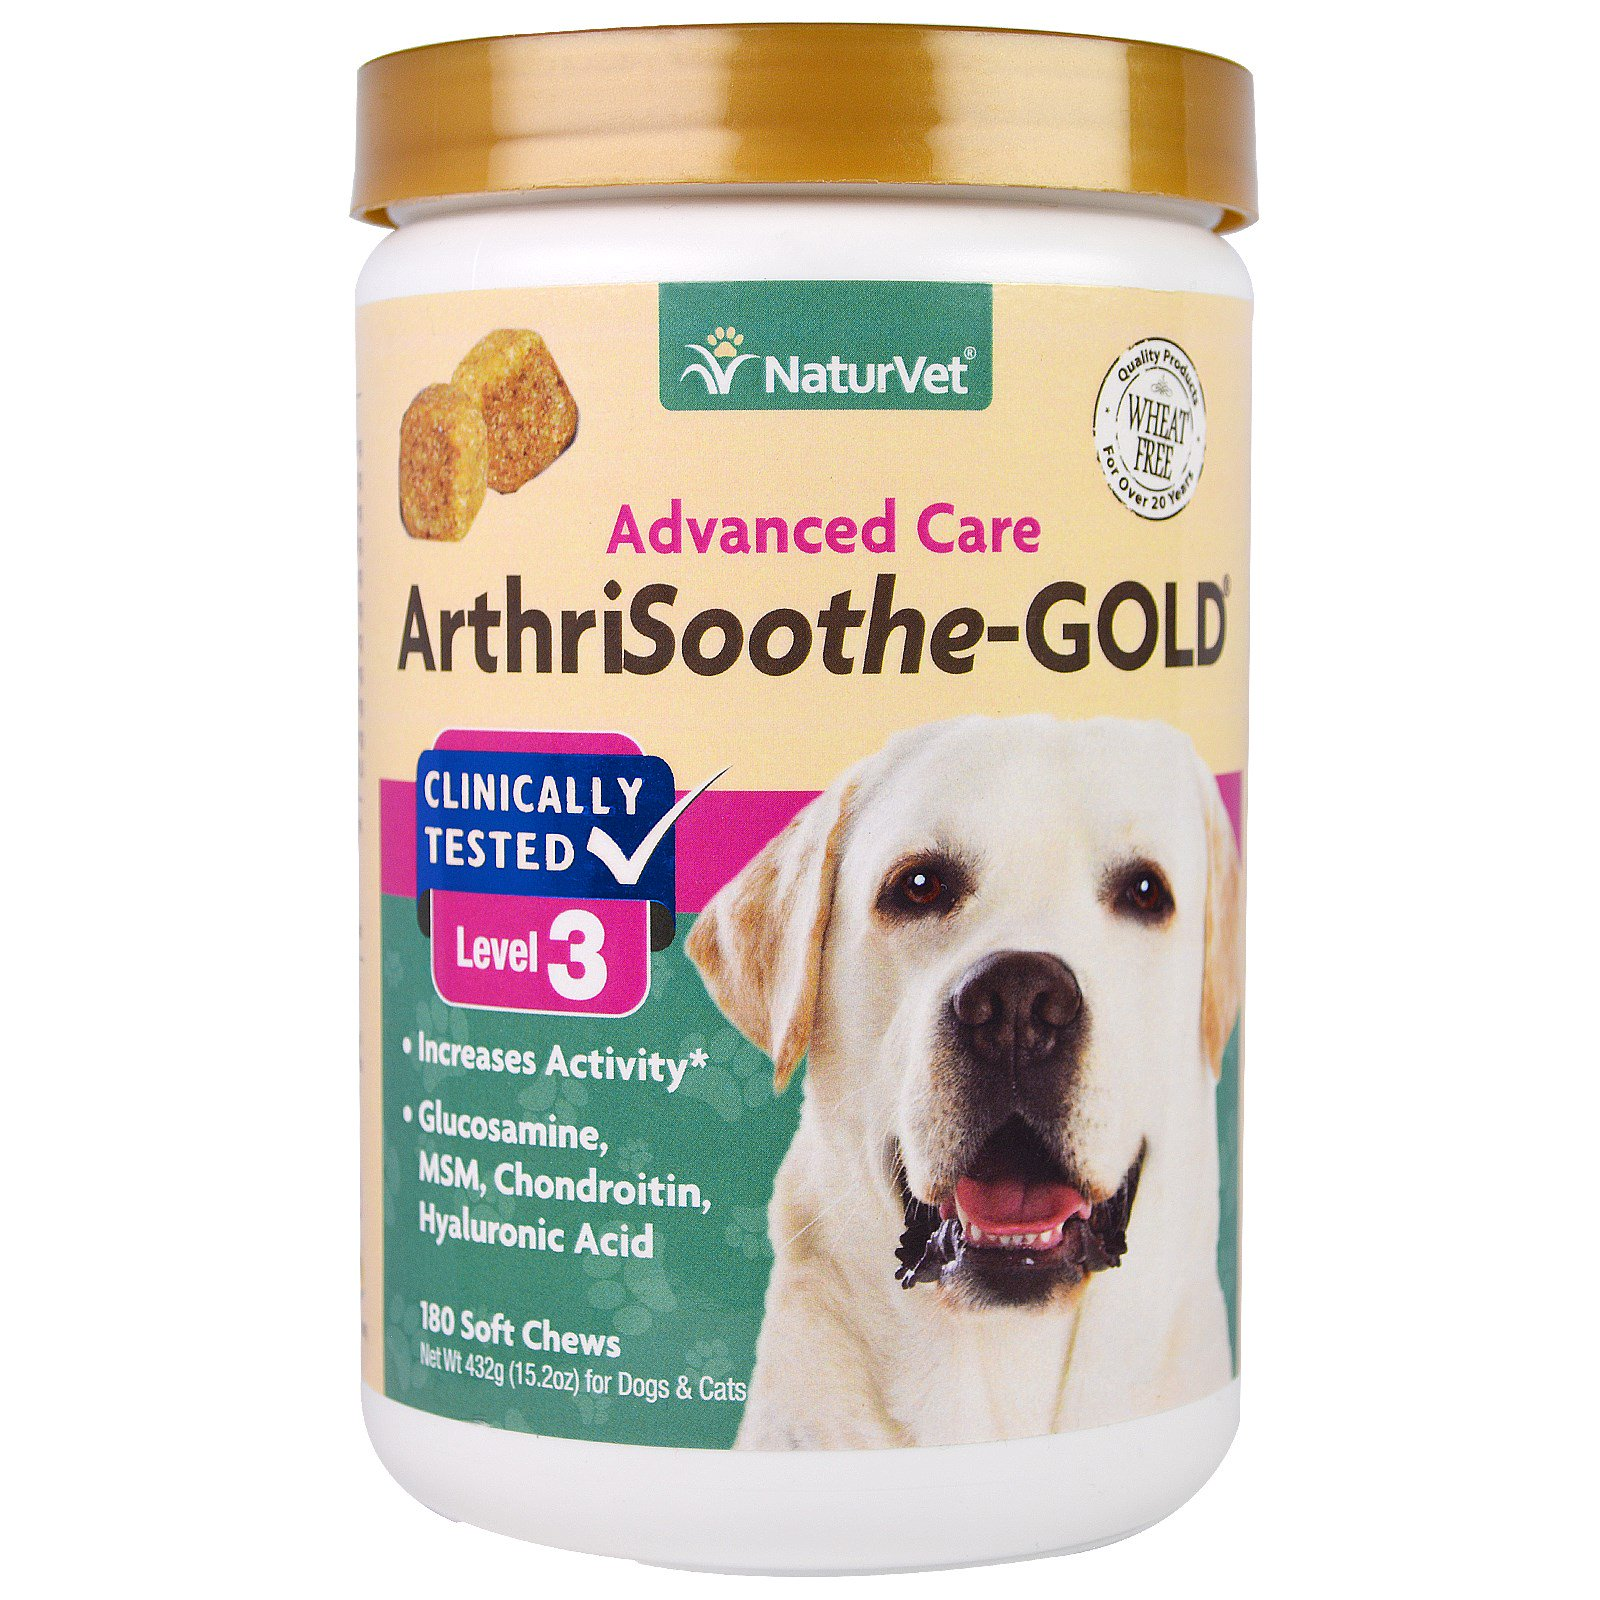 Naturvet Arthrisoothe Gold Advanced Care Level 3 180 Soft Chews